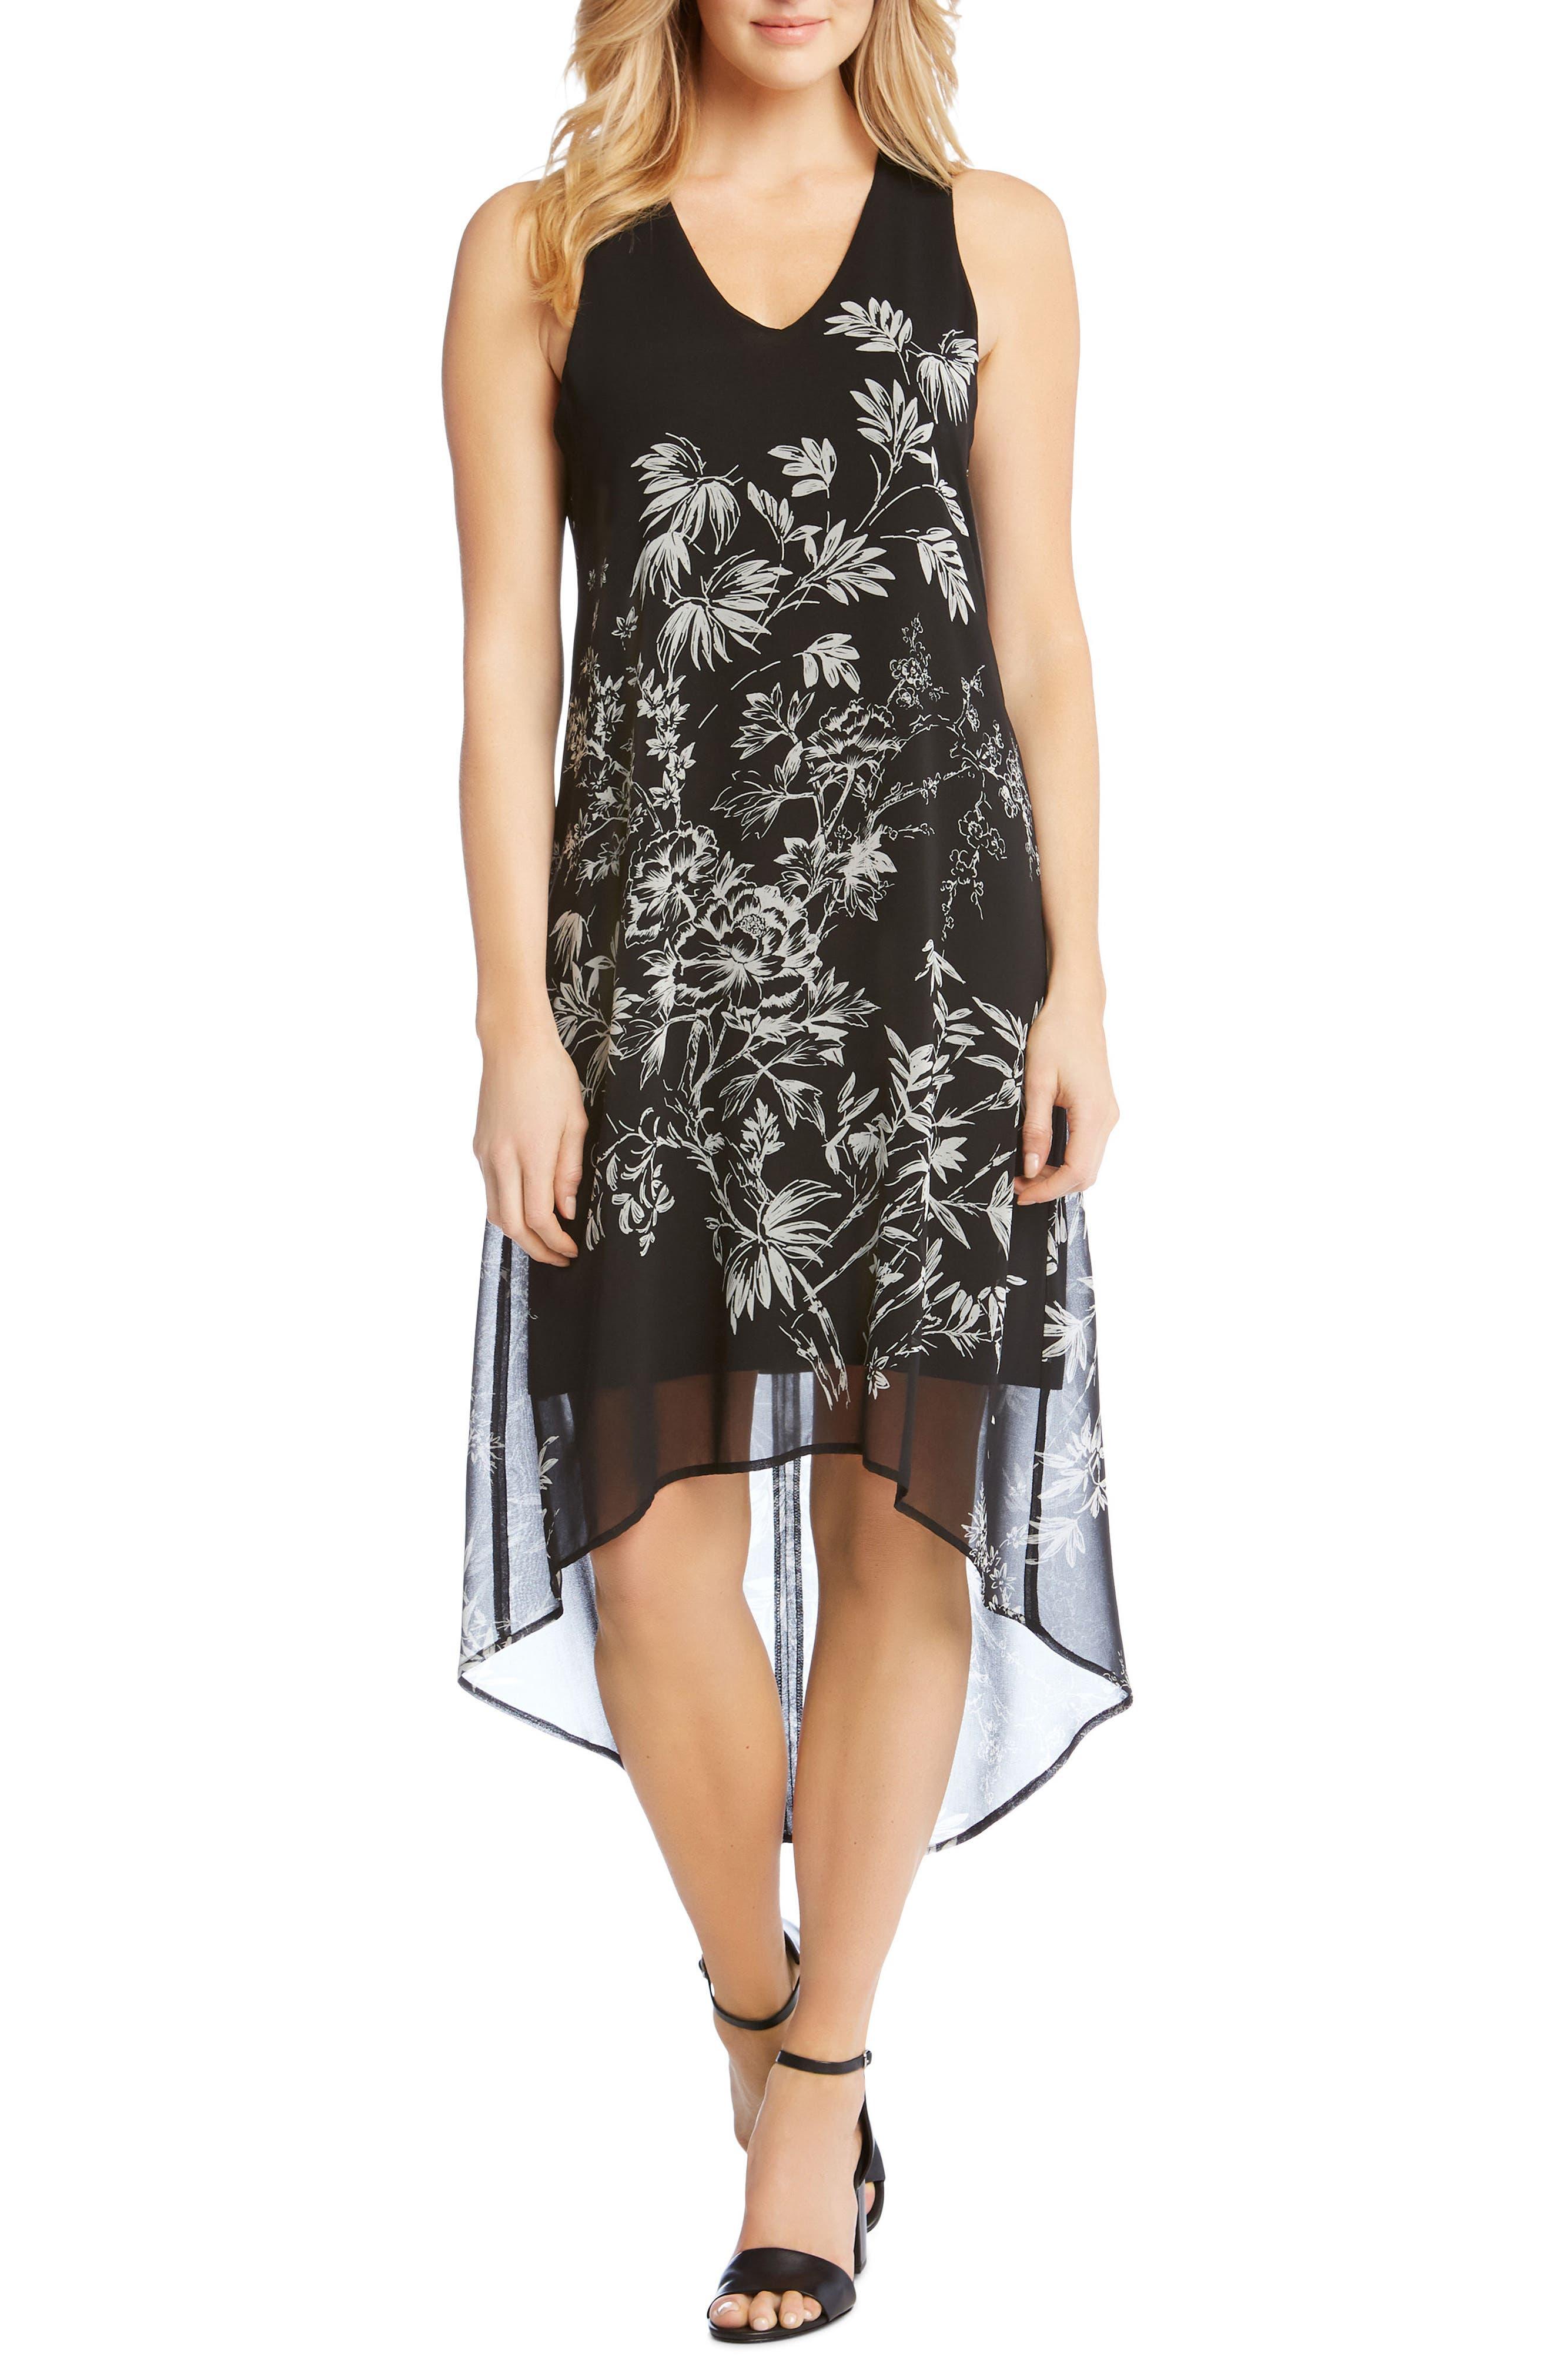 Sketched Floral Dress,                             Main thumbnail 1, color,                             PRINT